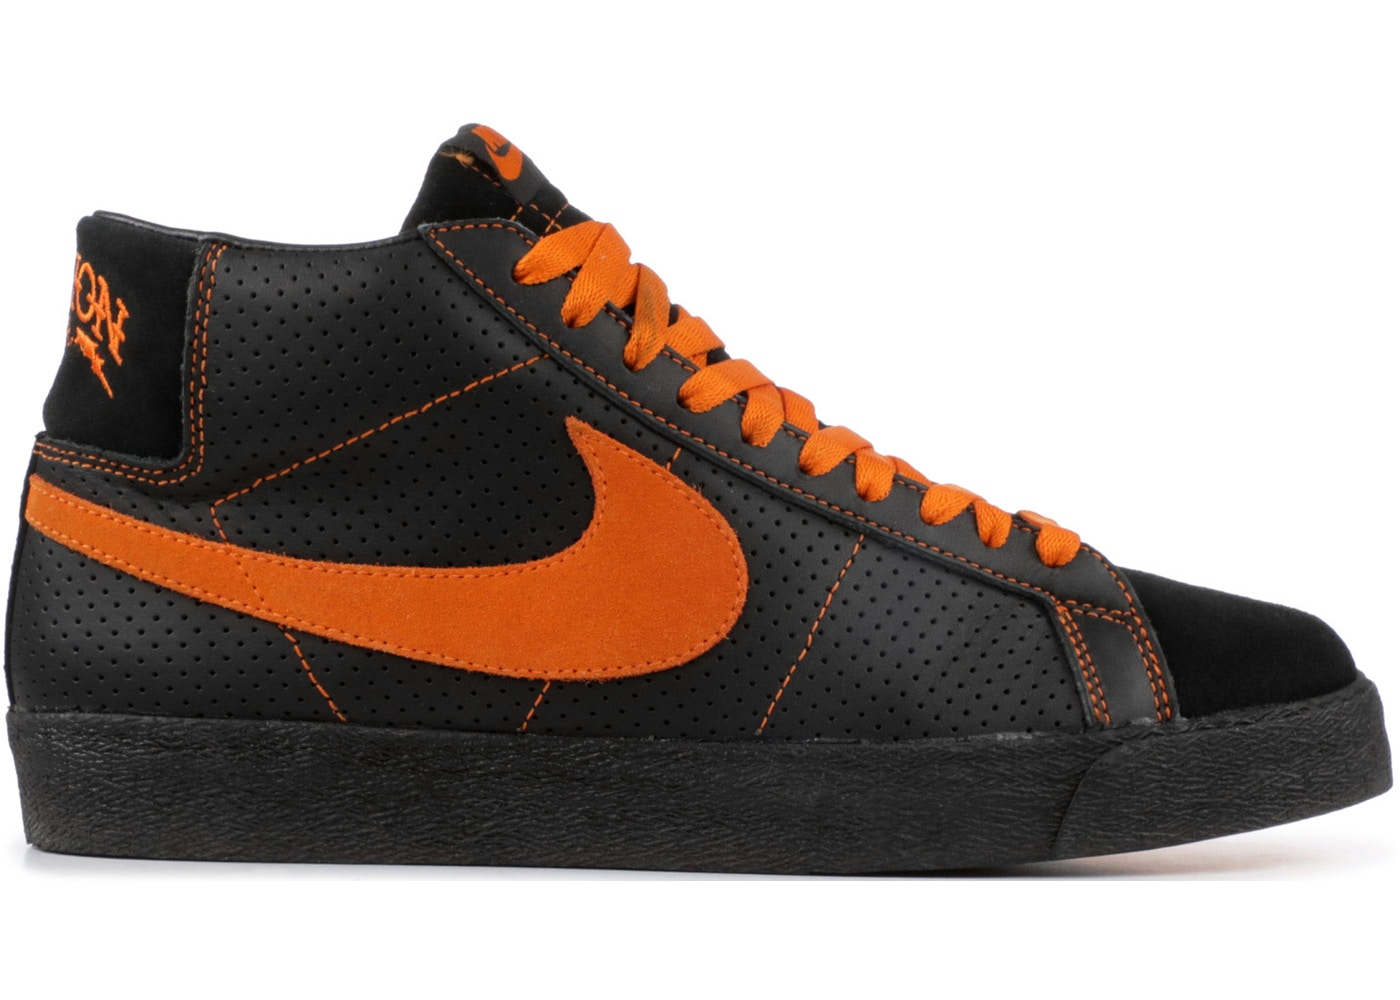 new style 4cb83 91e5c Nike SB Blazer Mission - 310801-071